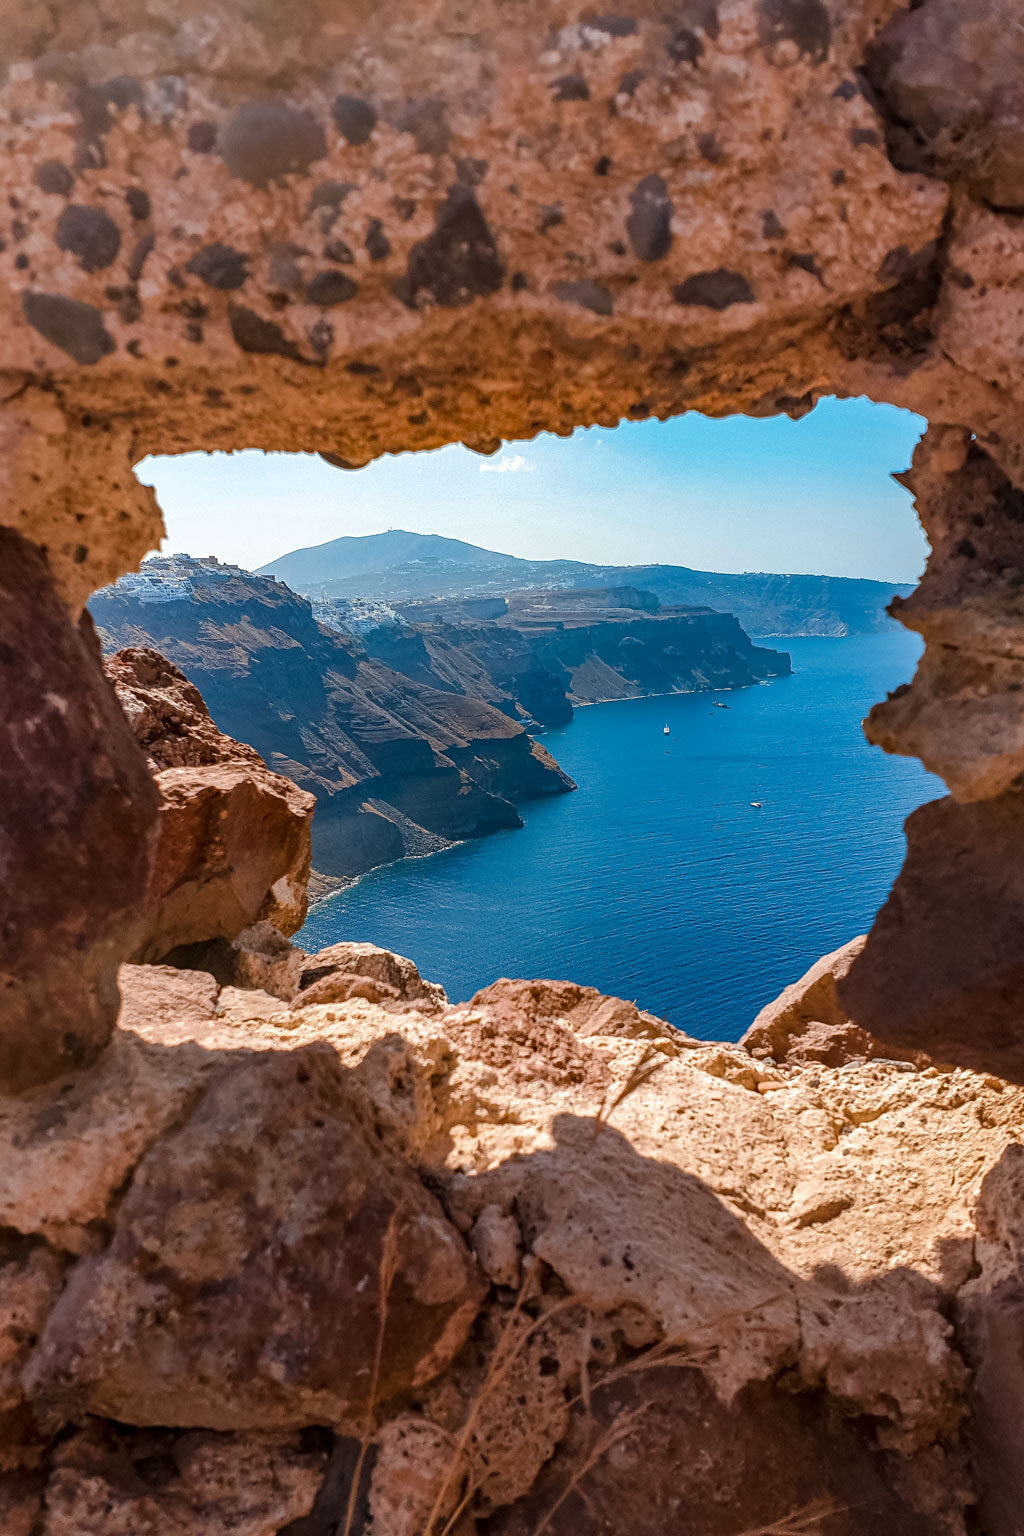 View from Skaros Rock to Fira Santorini